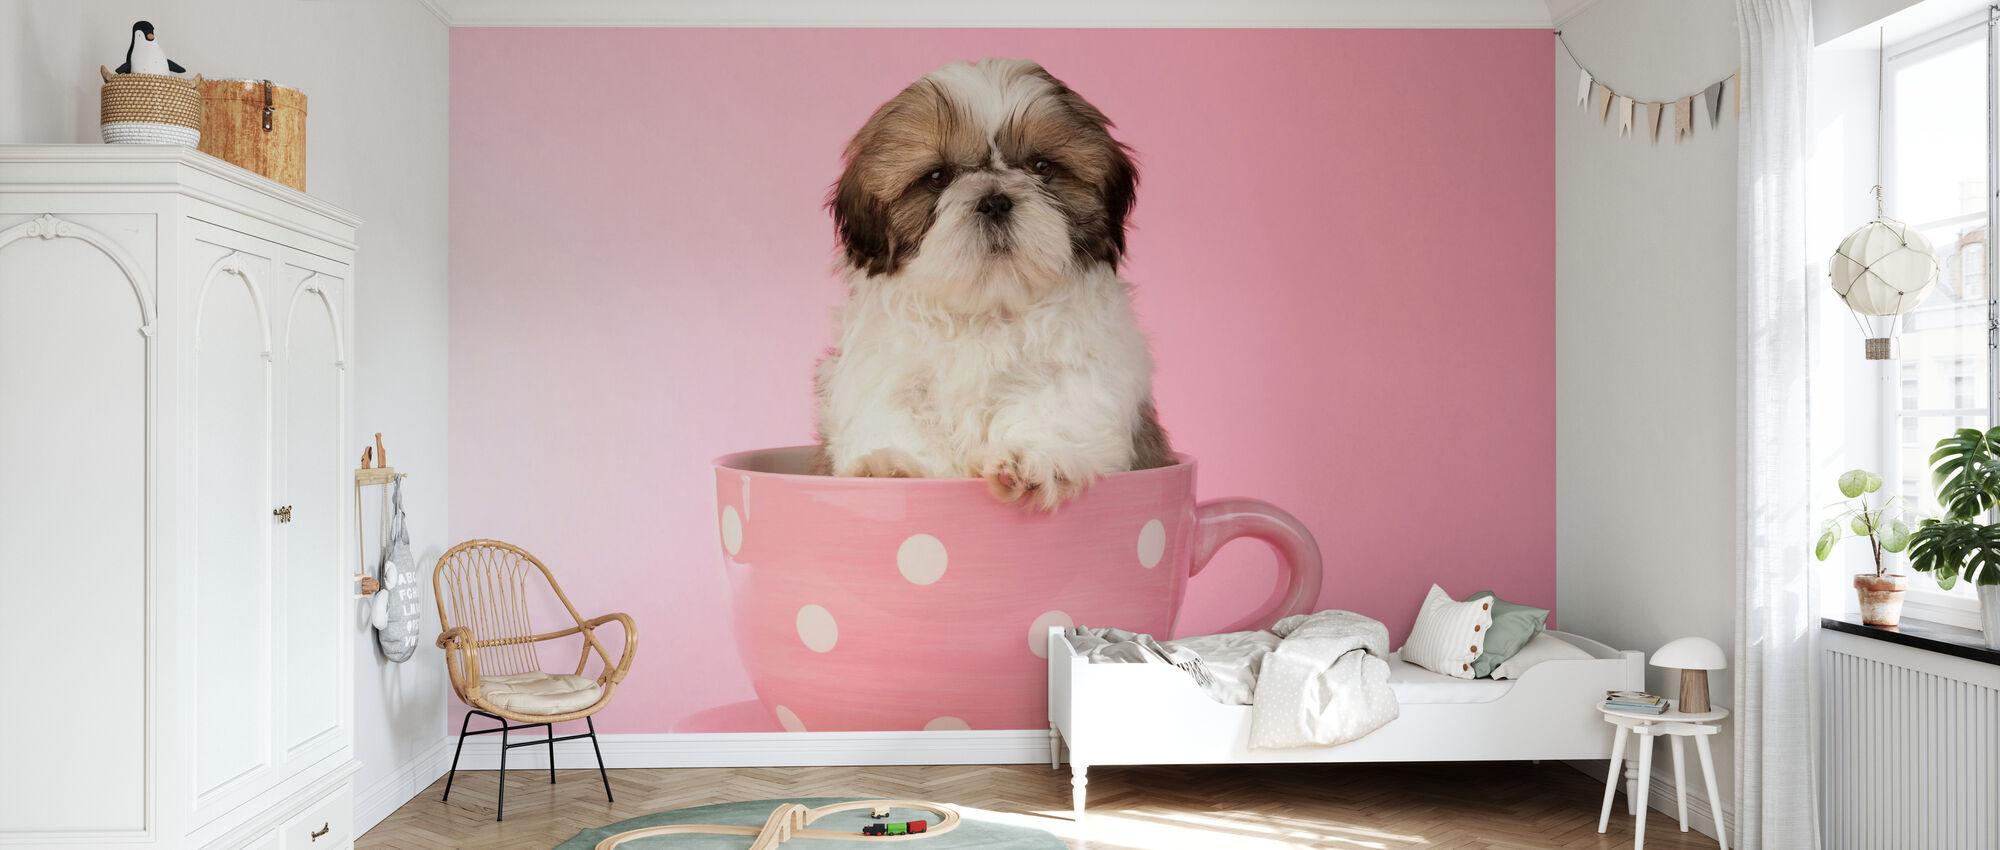 Dog in Cup - Wallpaper - Kids Room